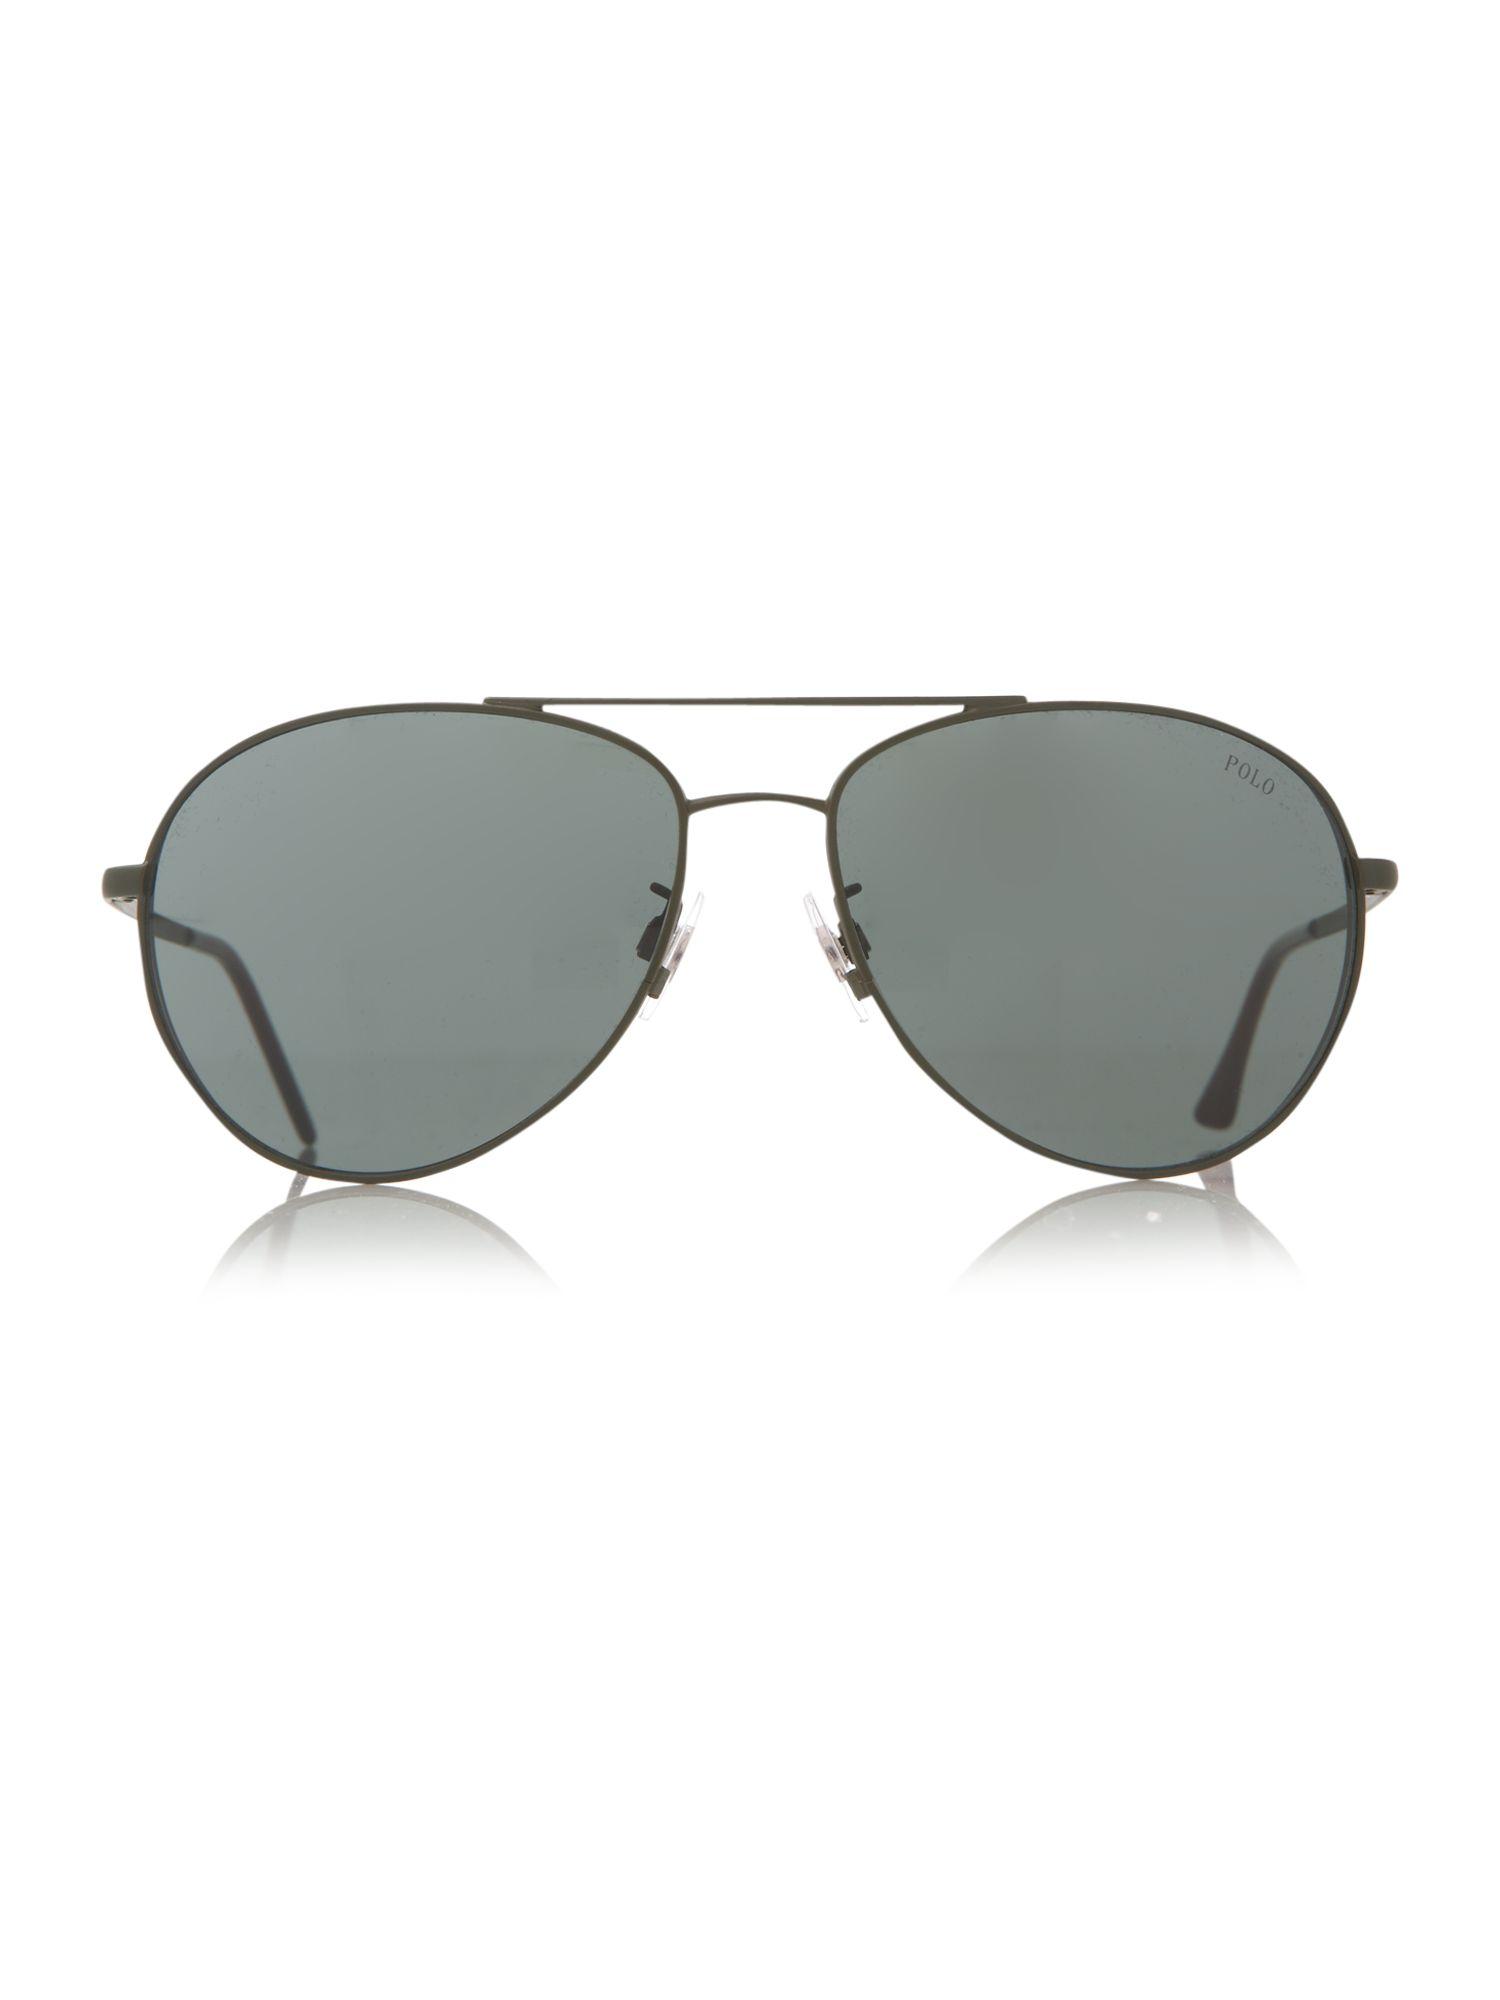 Ralph Lauren Sunglasses Men  polo ralph lauren mens sunglasses in gray for men lyst